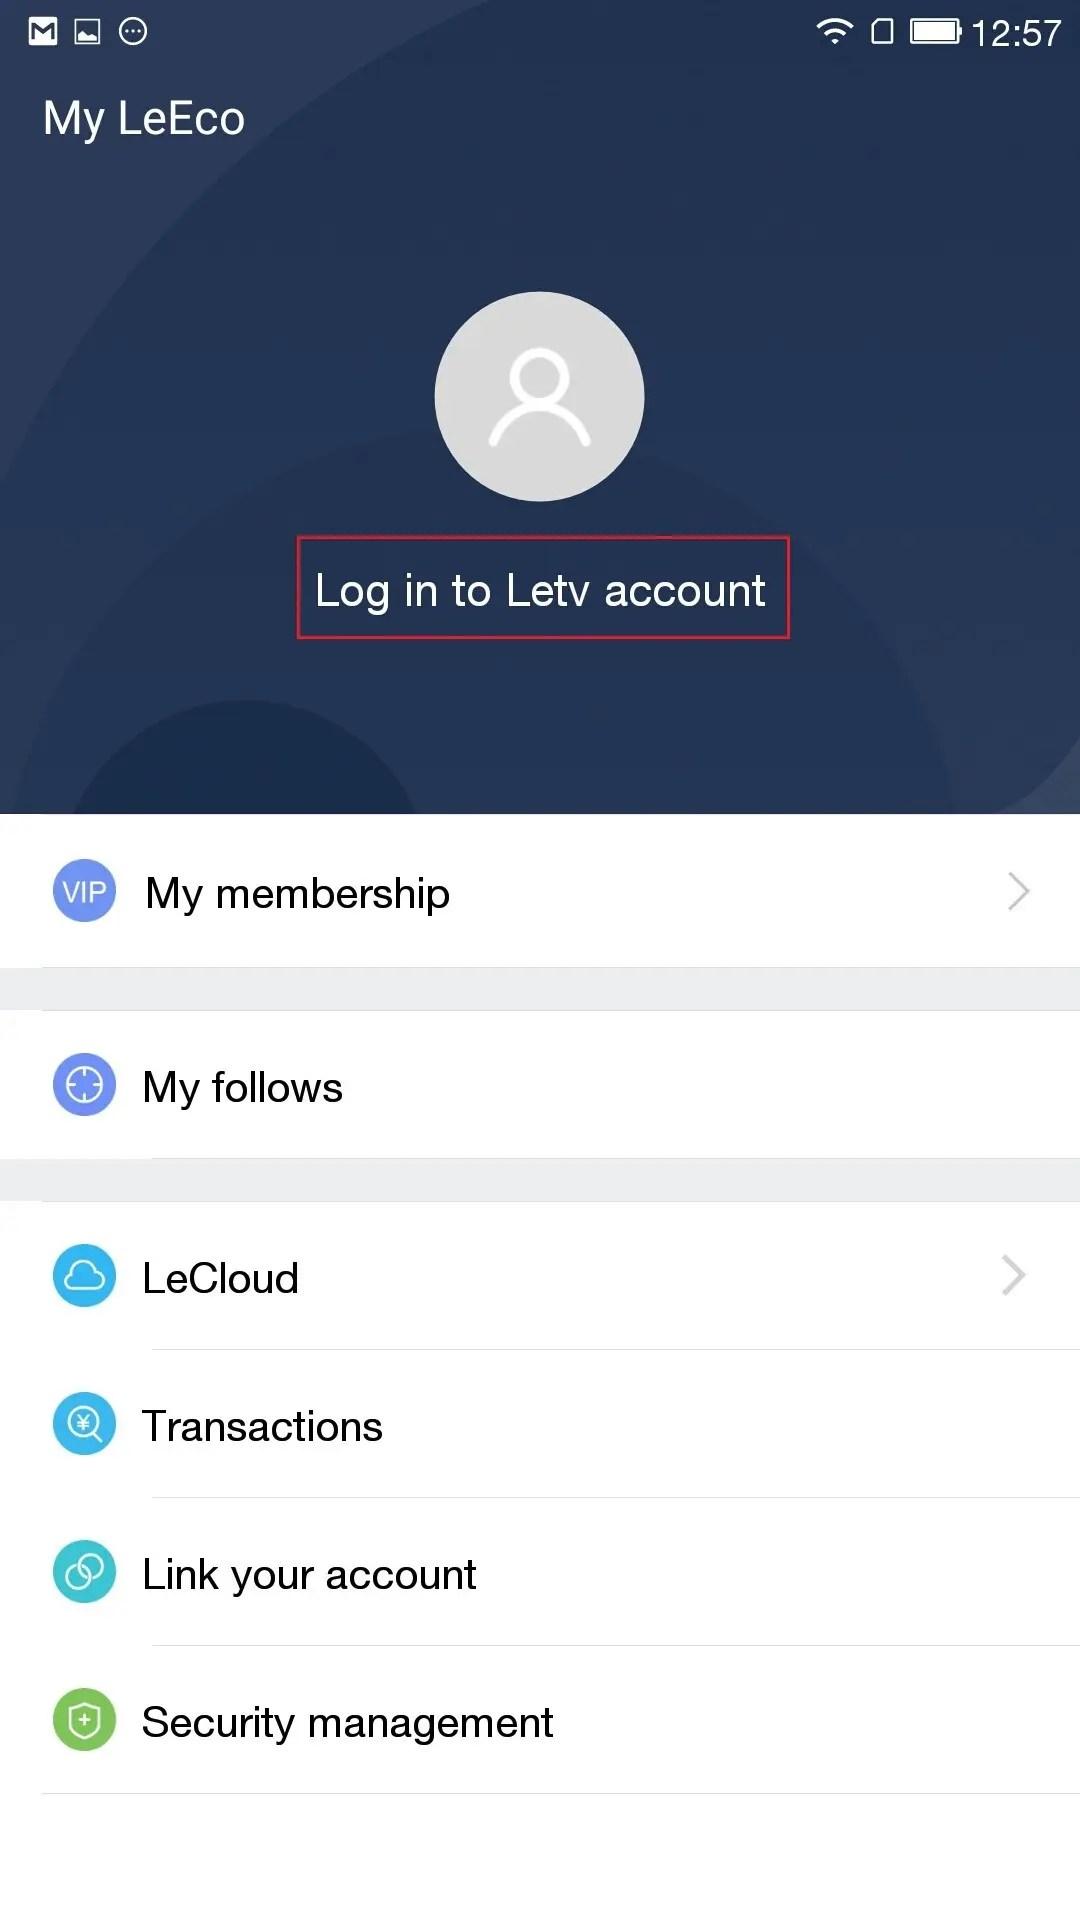 Log in to Letv accountを押す